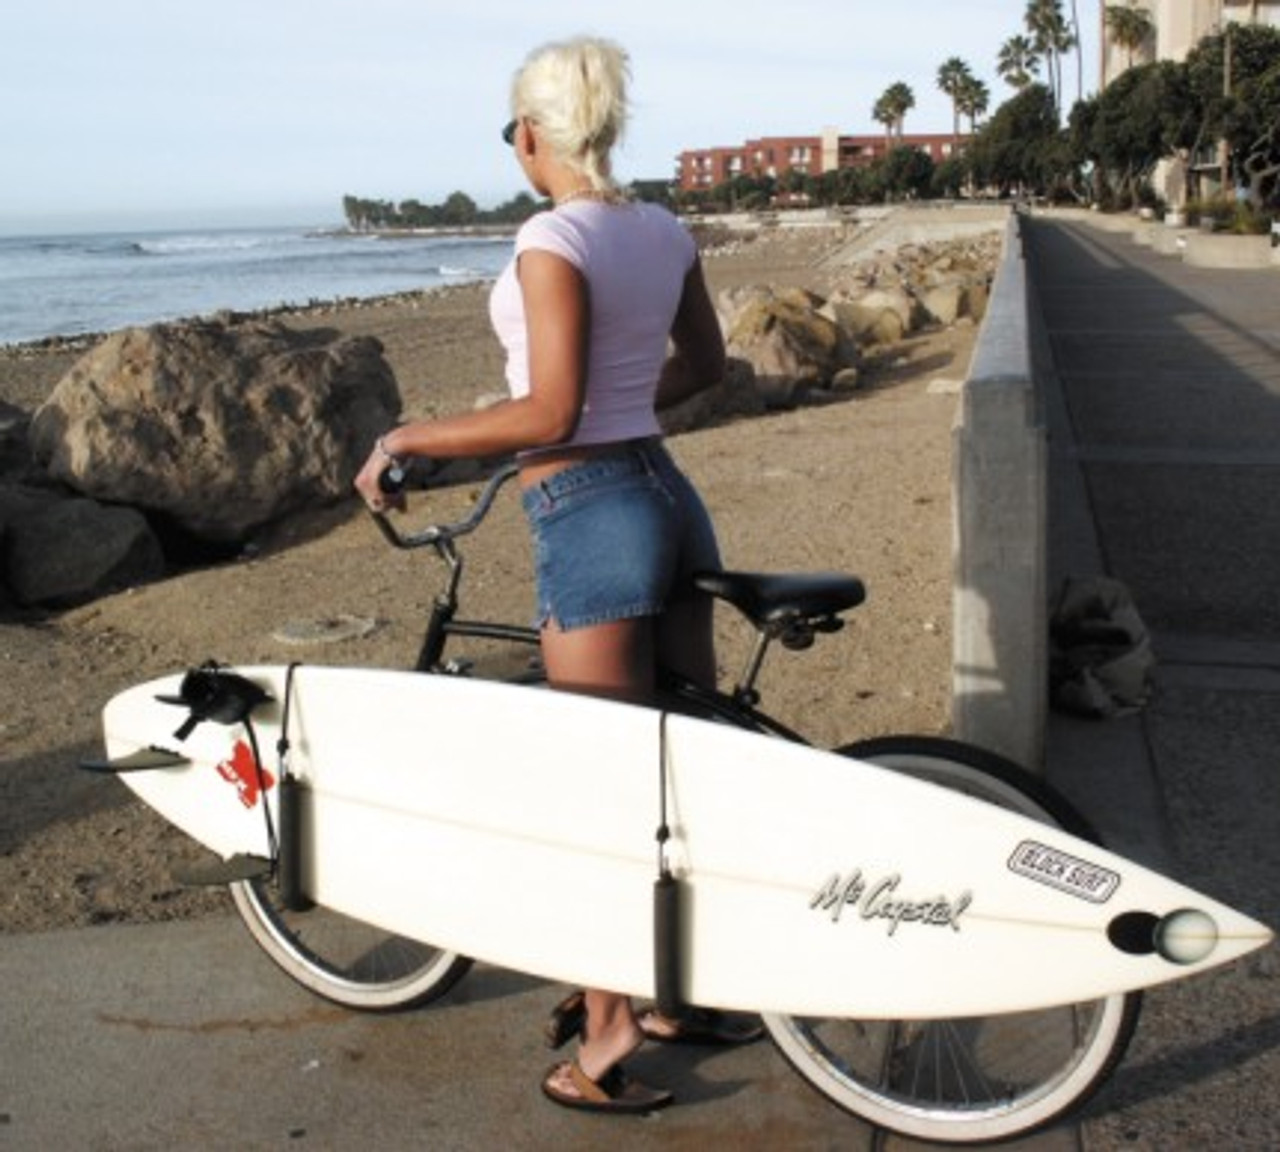 surfboard side rack for bike